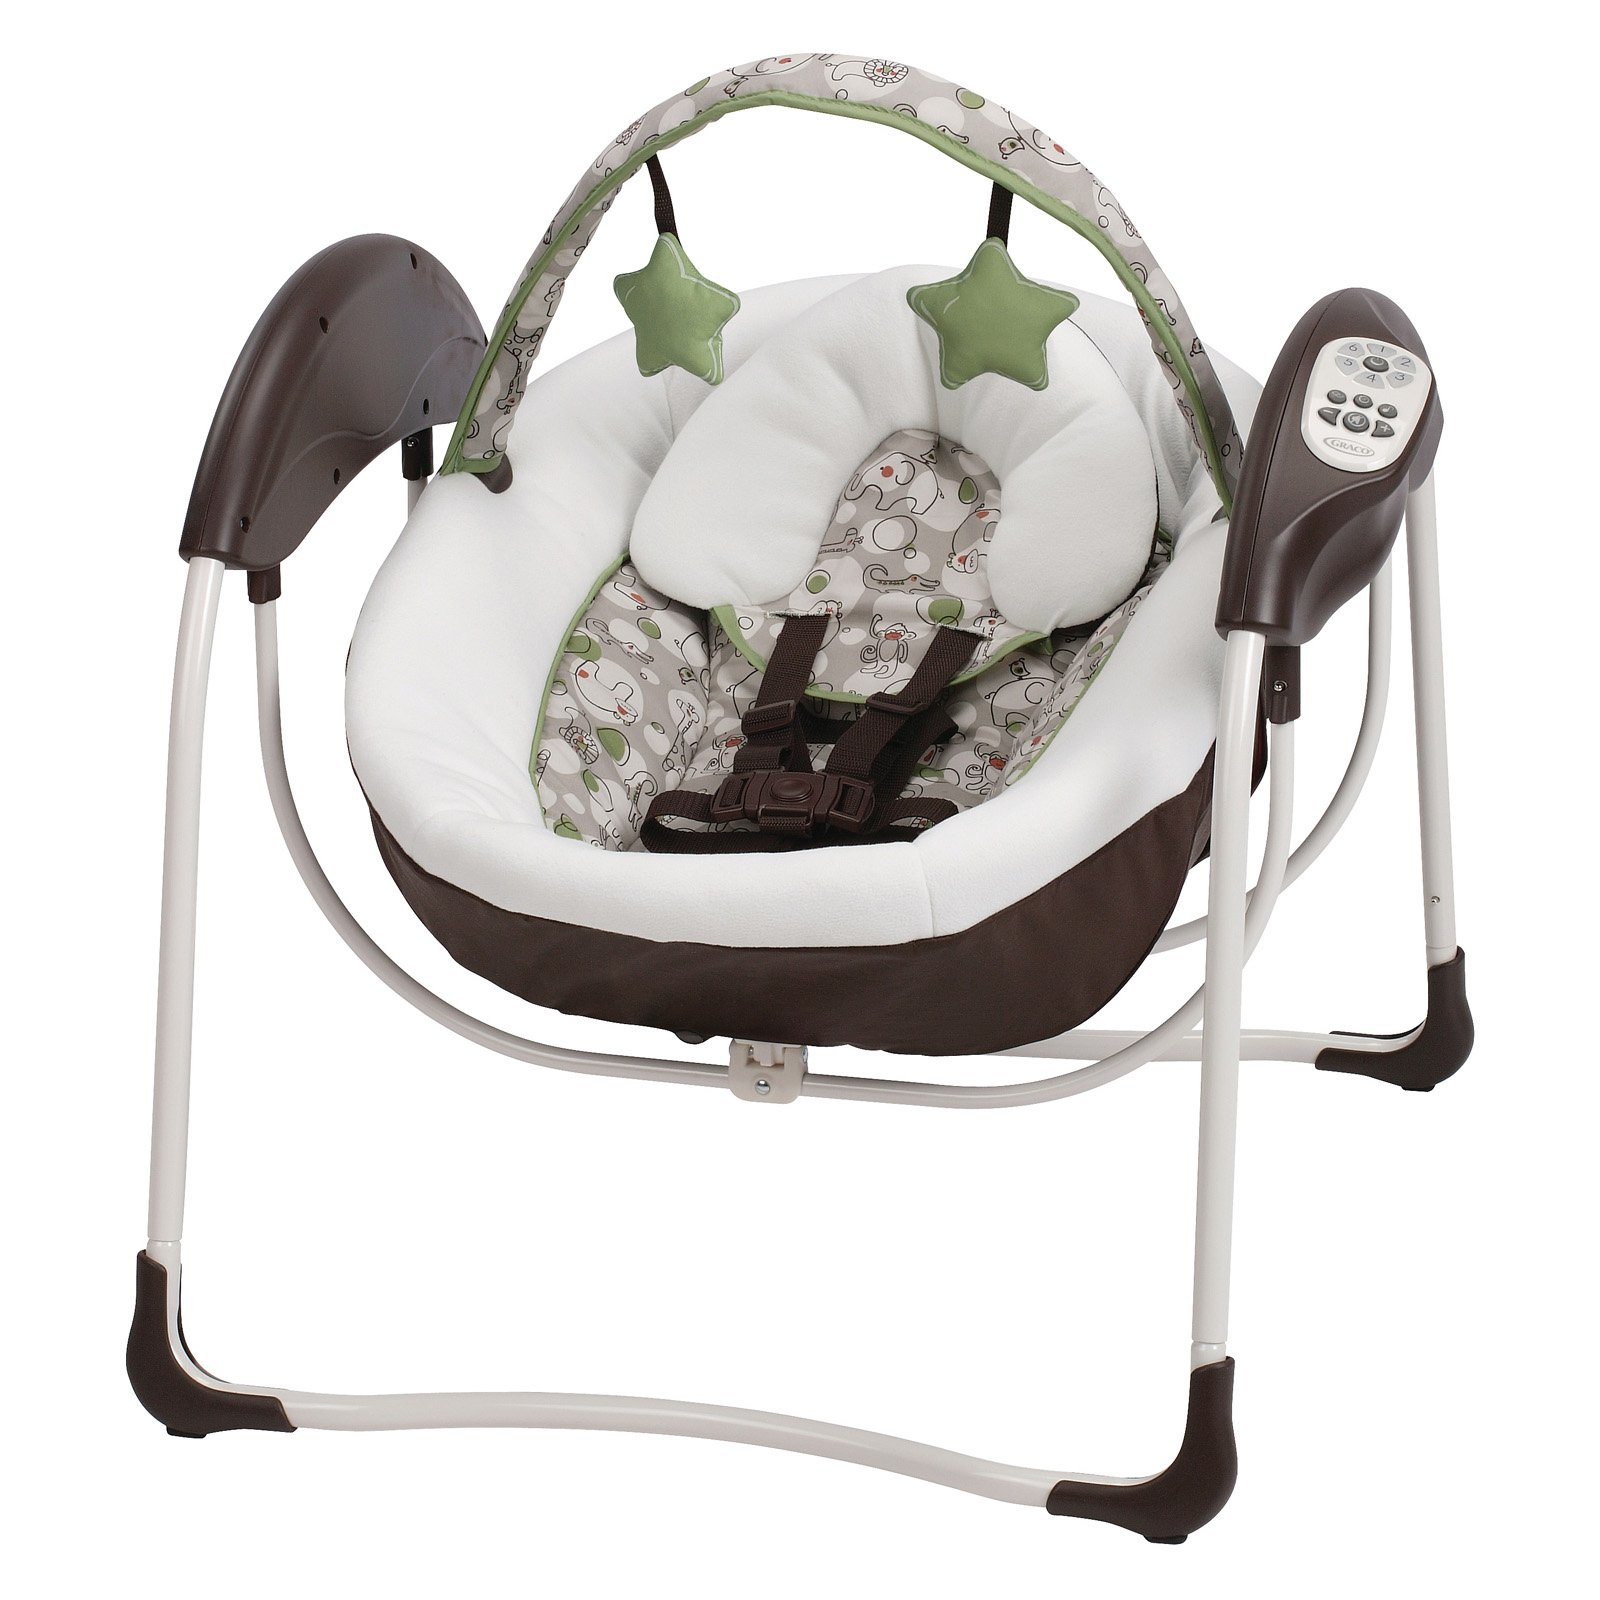 Graco Glider Lite Baby Swing Walmart Com